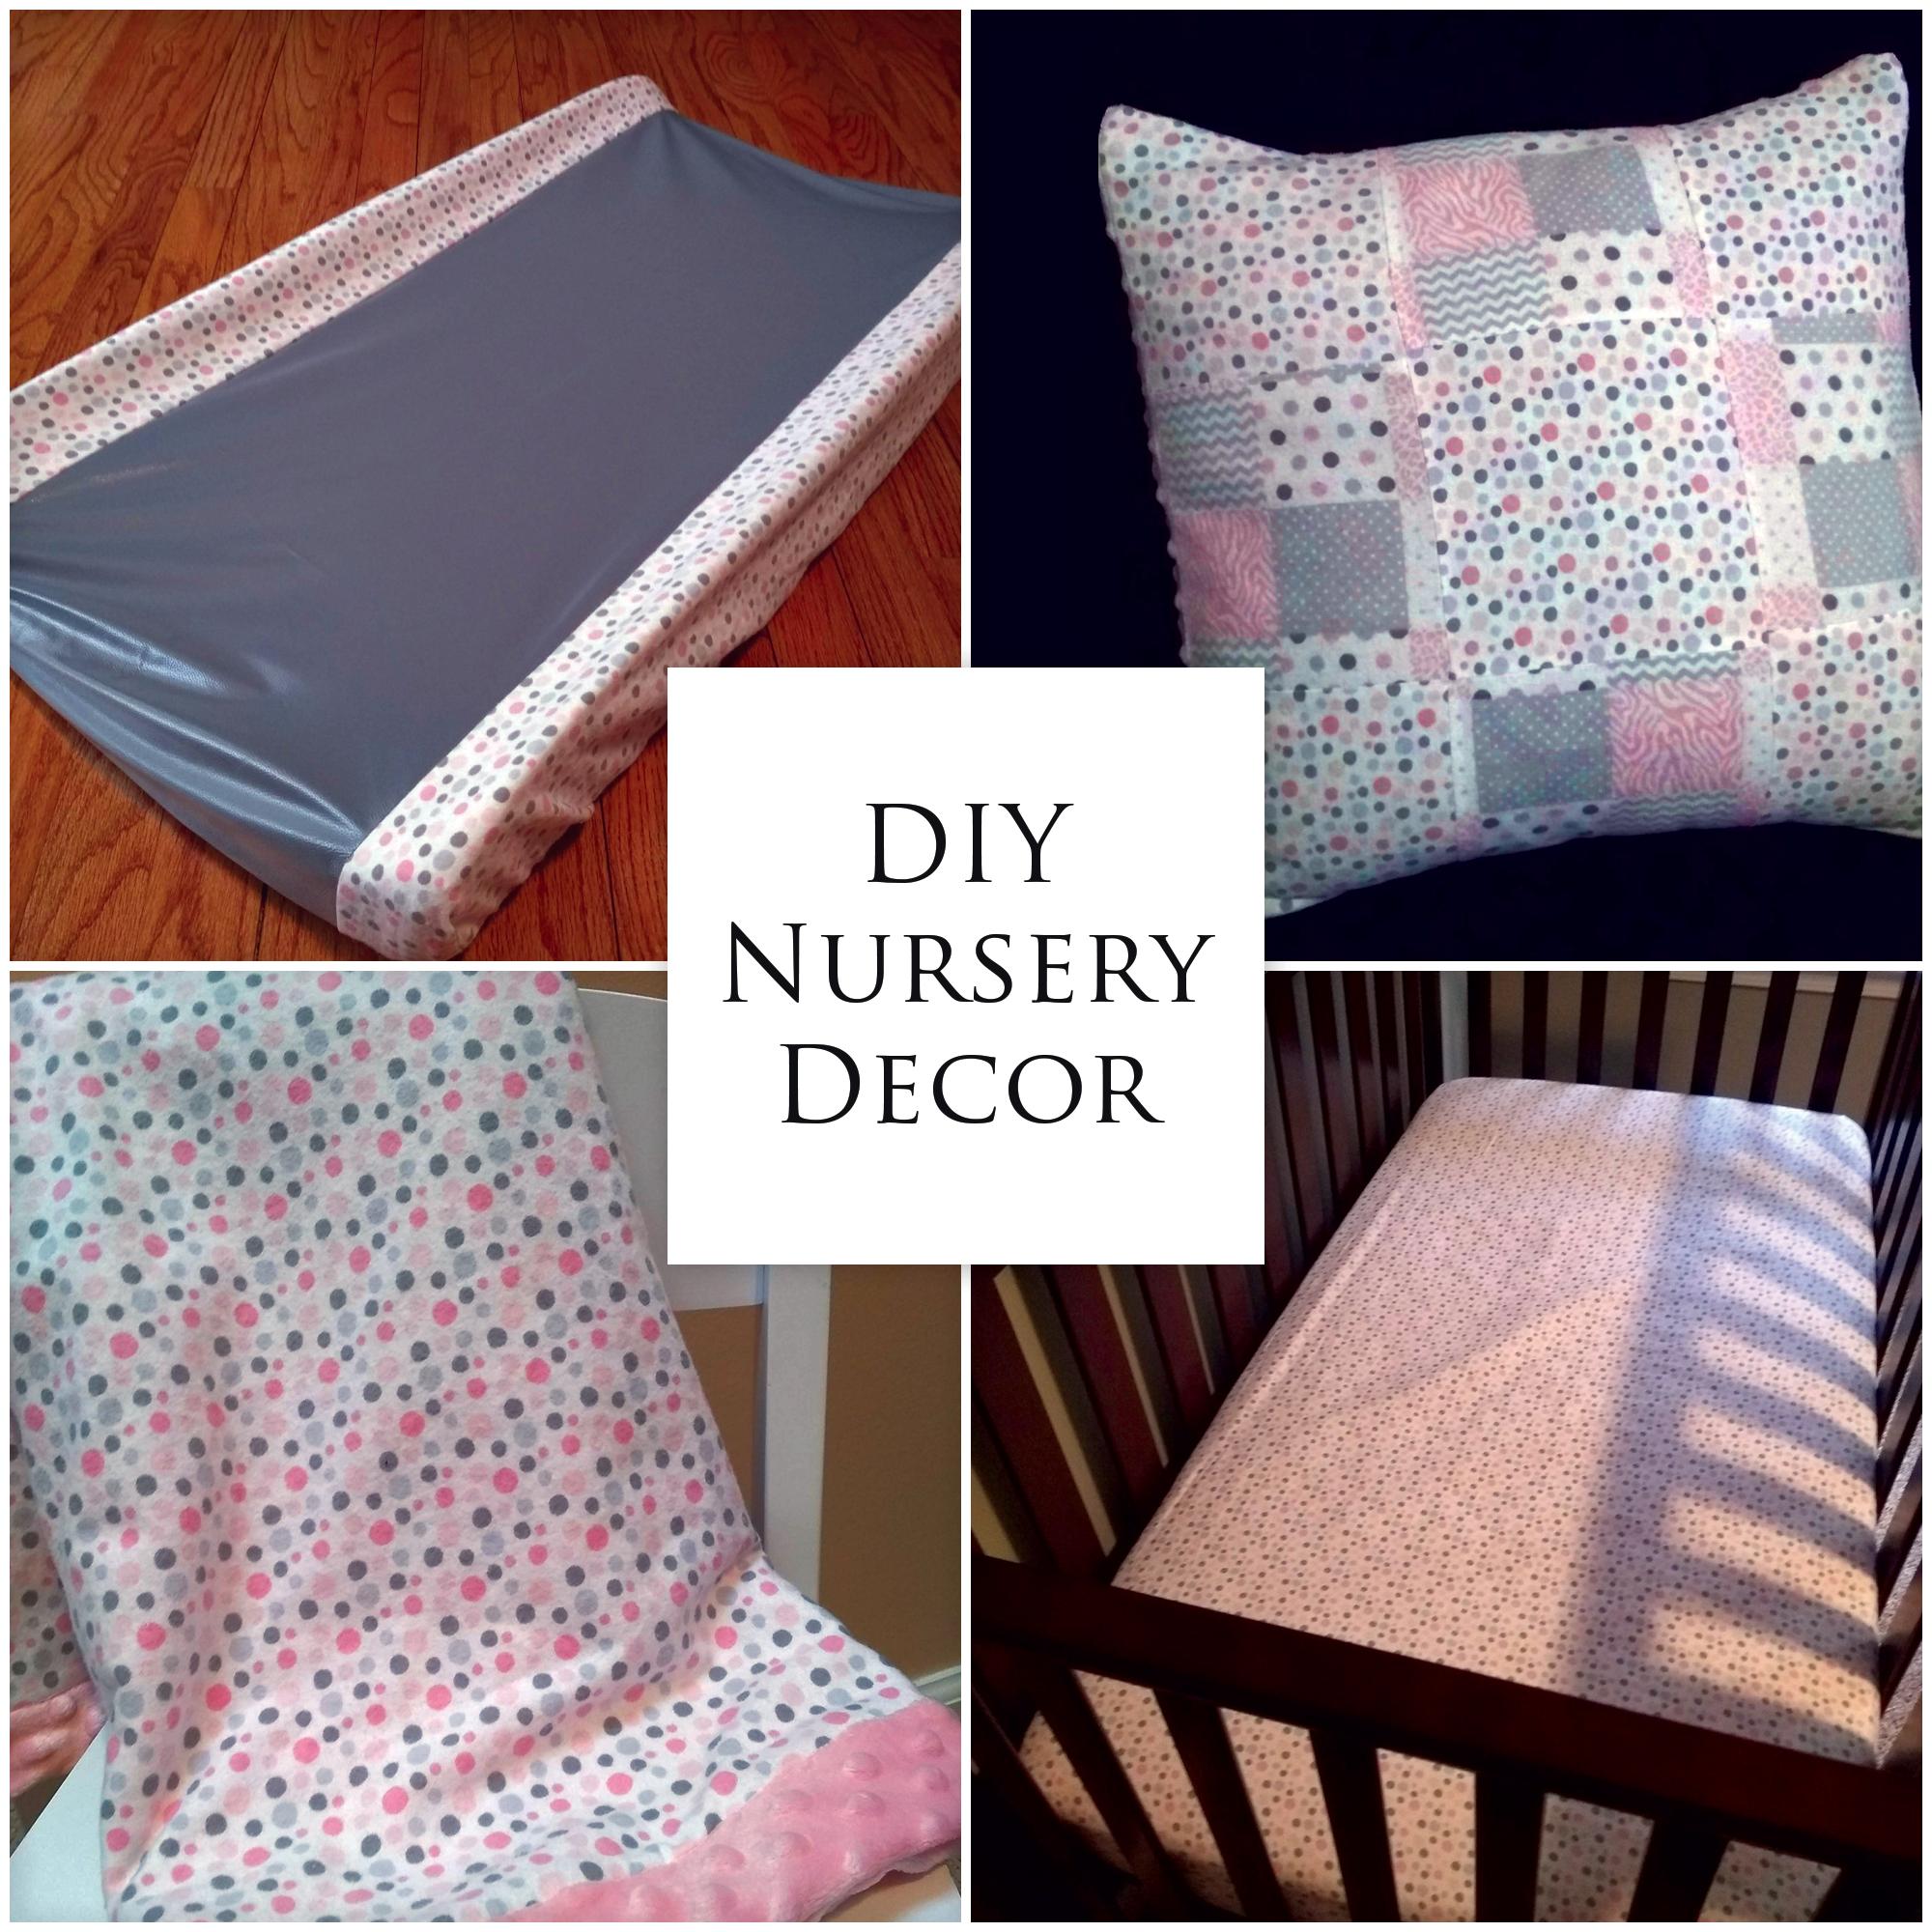 Diy Nursery Decor From Start To Finish K Krafts